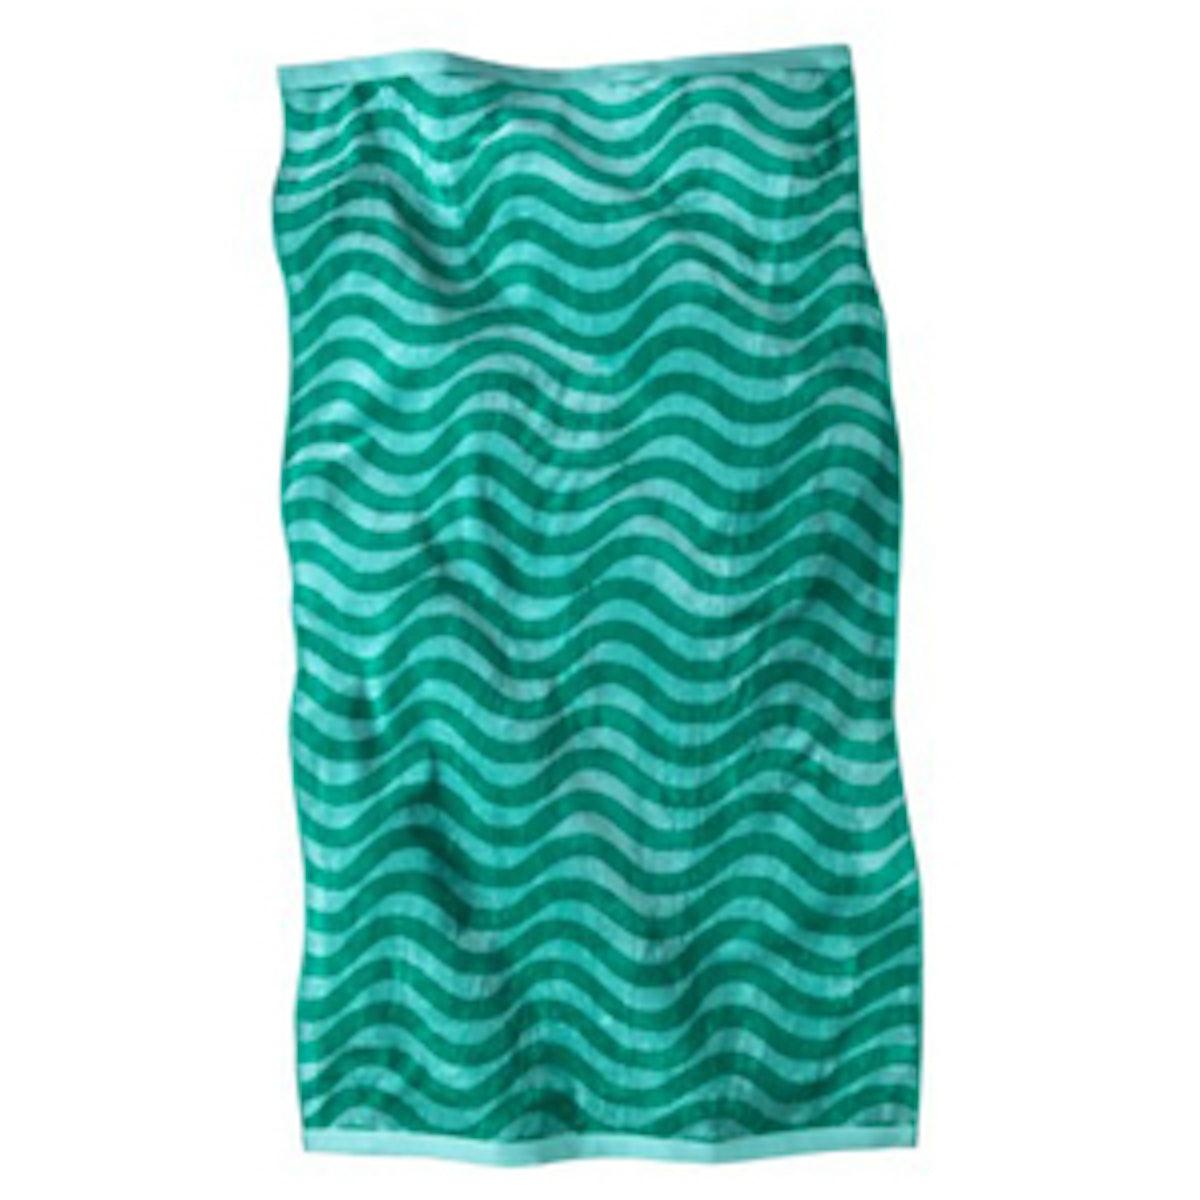 Limited Edition Jeff Canham Beach Towel